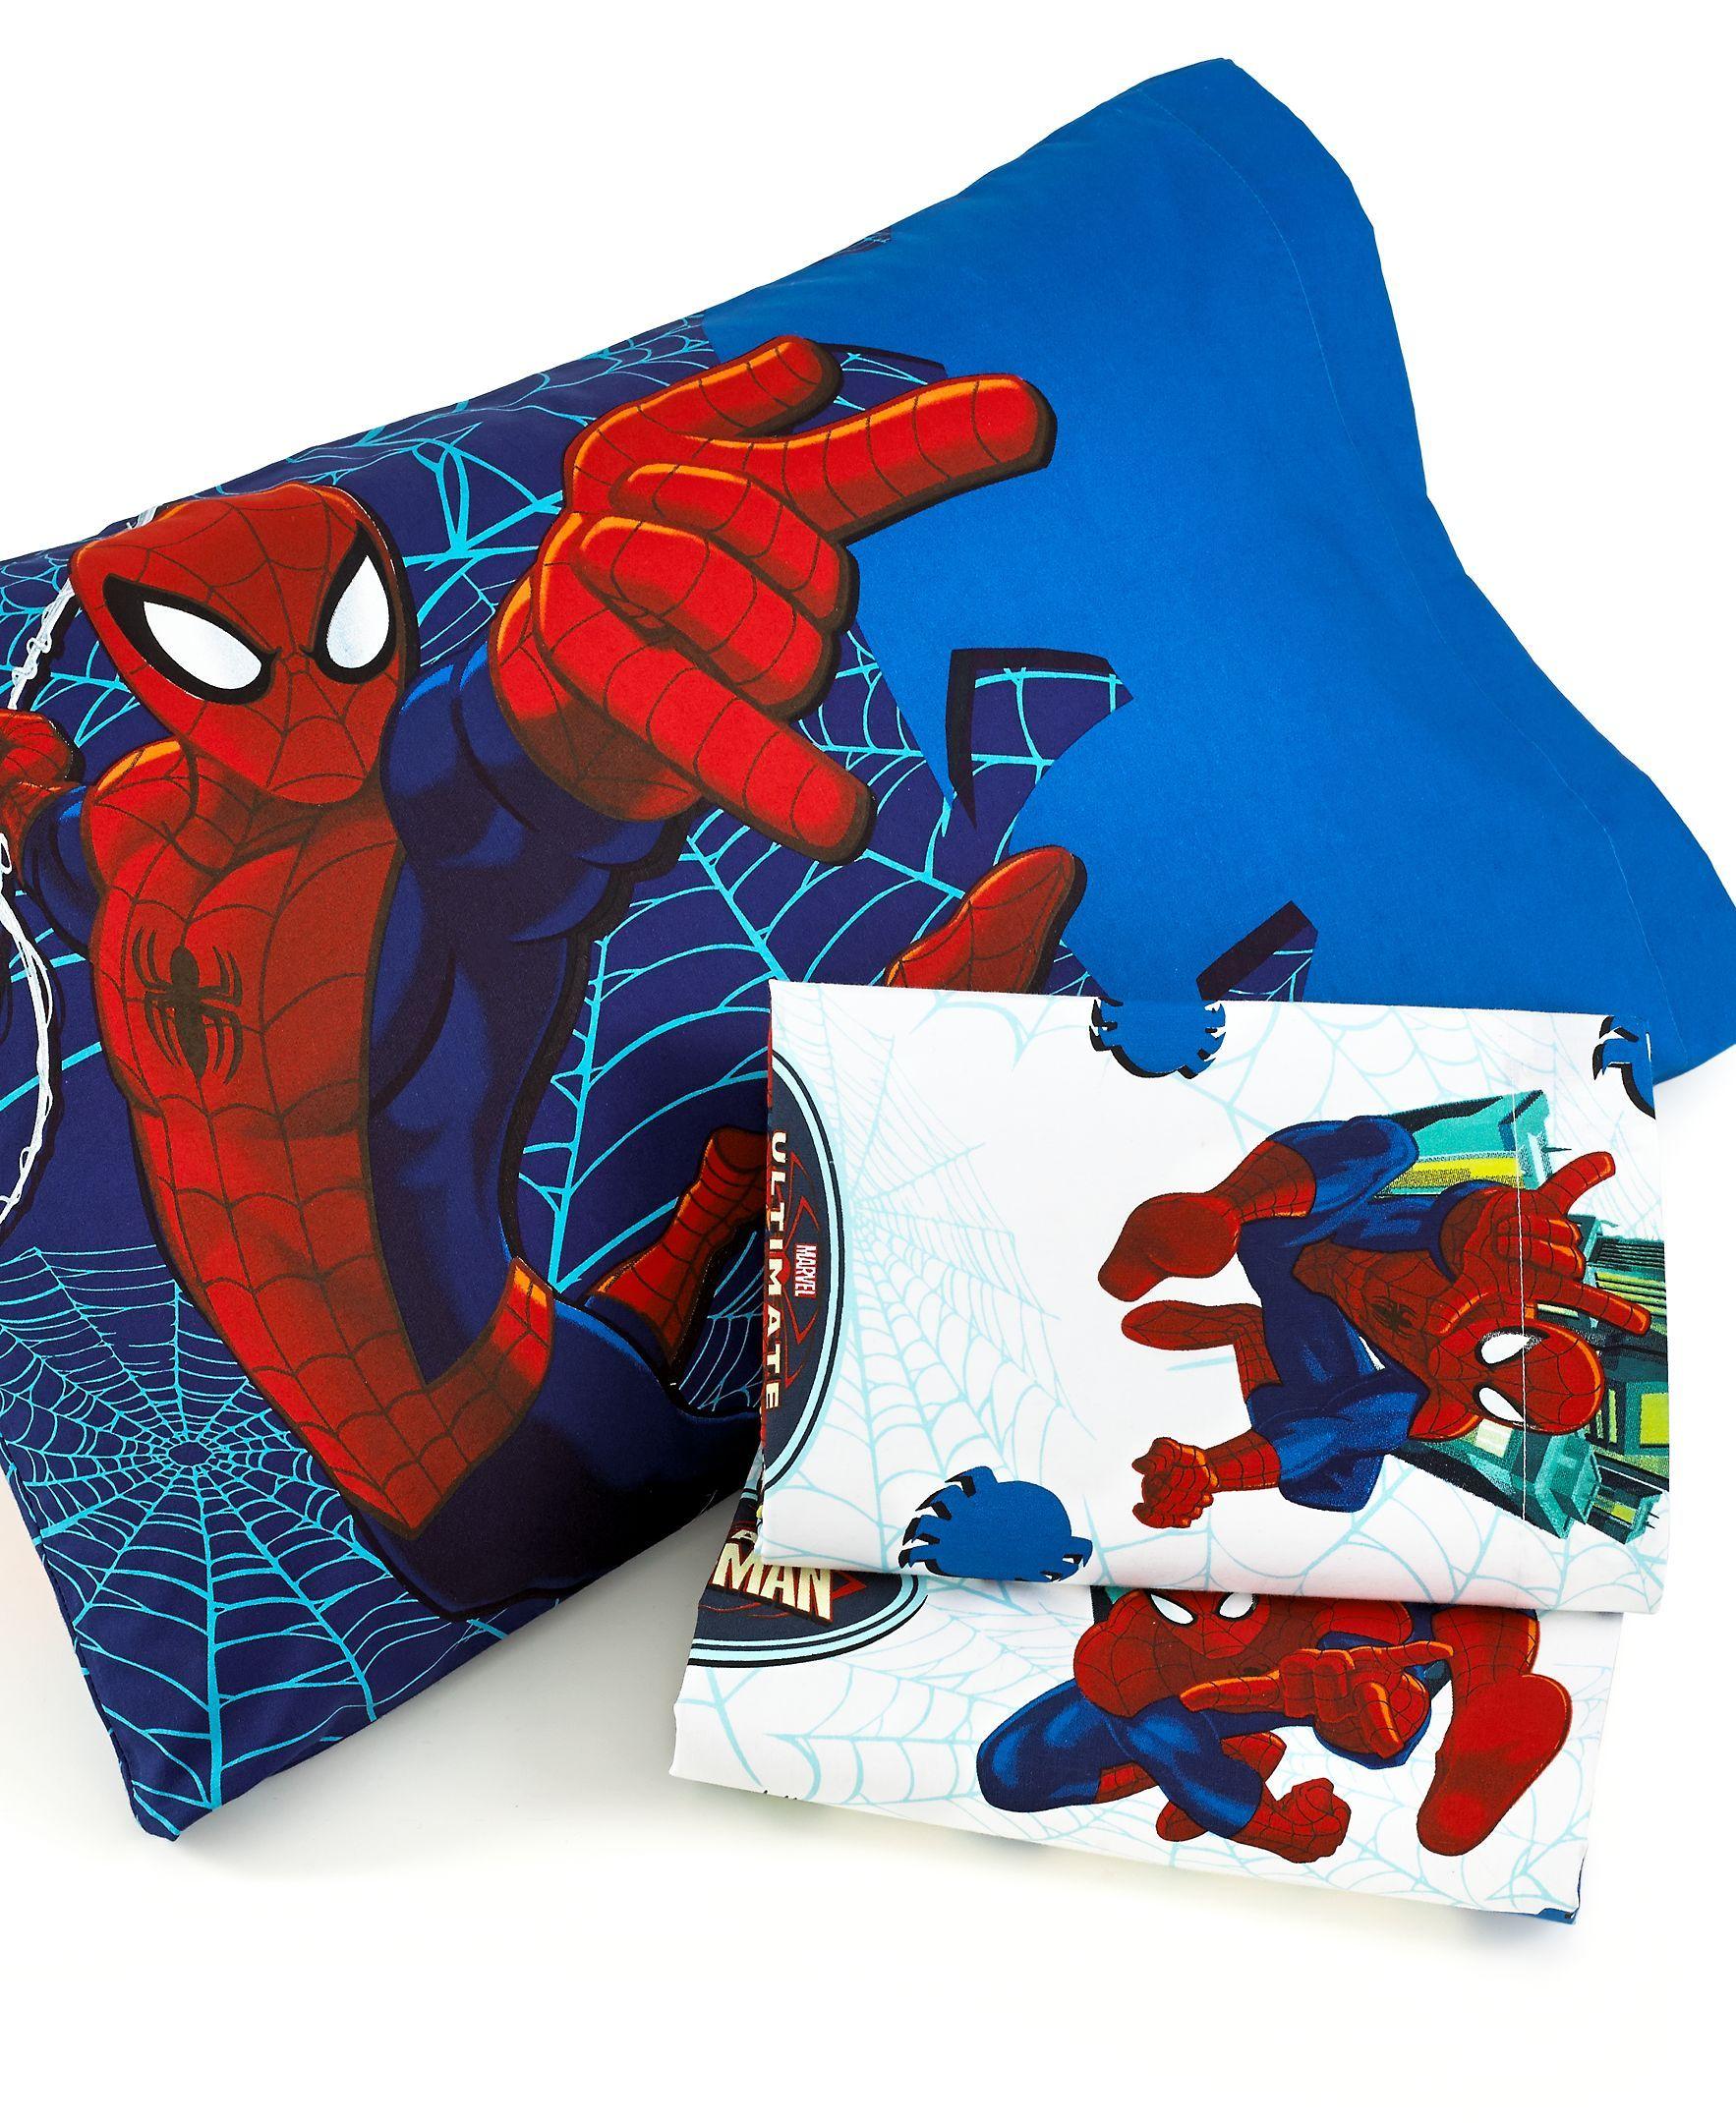 Inspiring Spiderman Bedroom Set Style